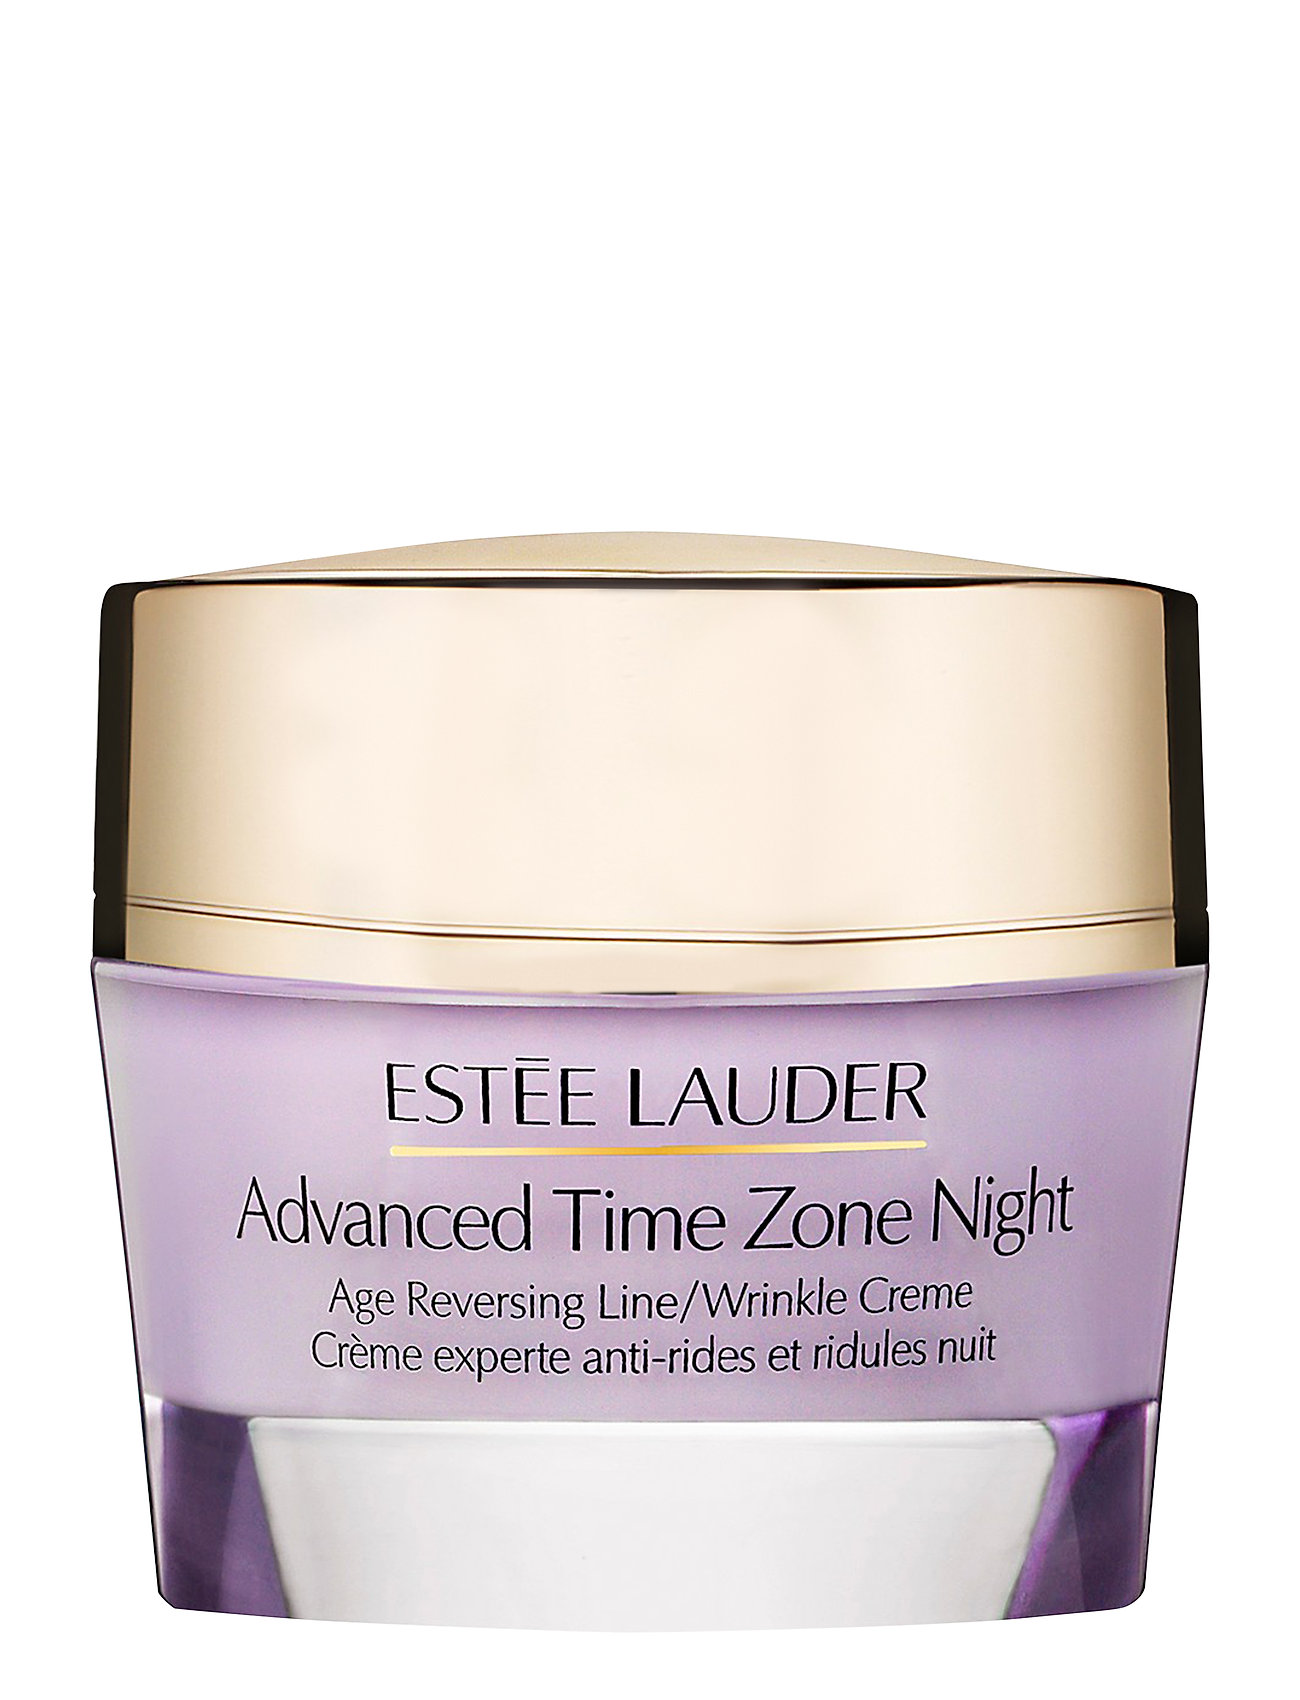 Advanced Time Zone Night Creme EstÈe Lauder  til Damer i Klar